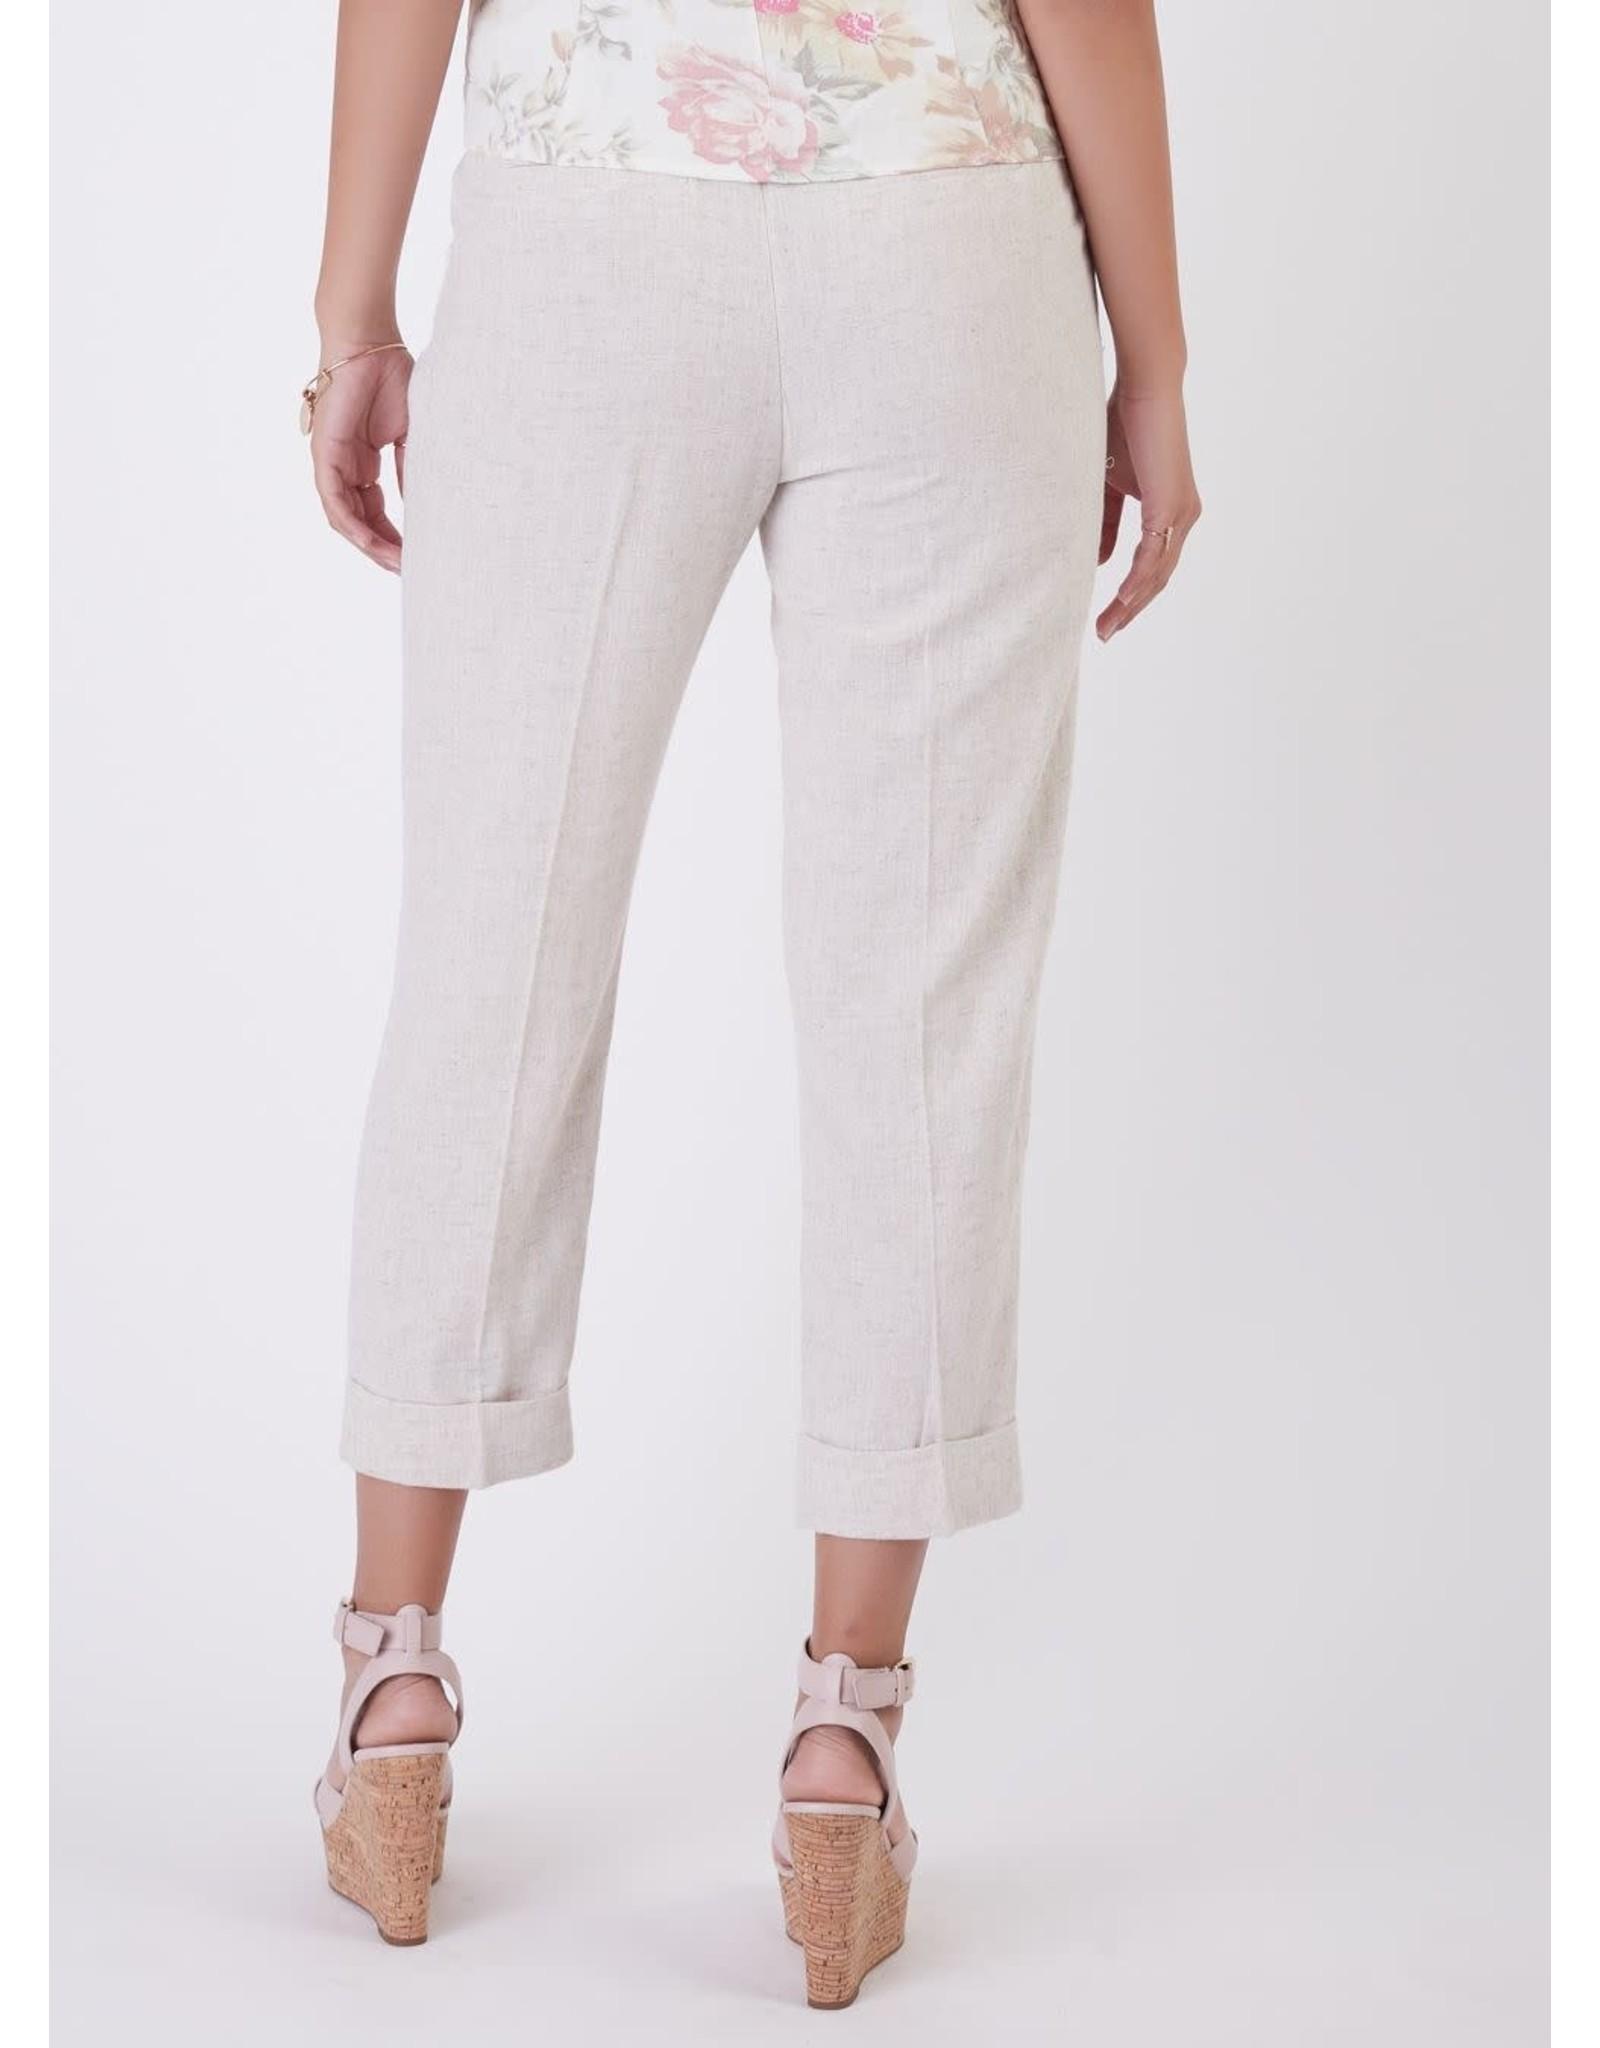 Dex - Cuffed Linen Pant